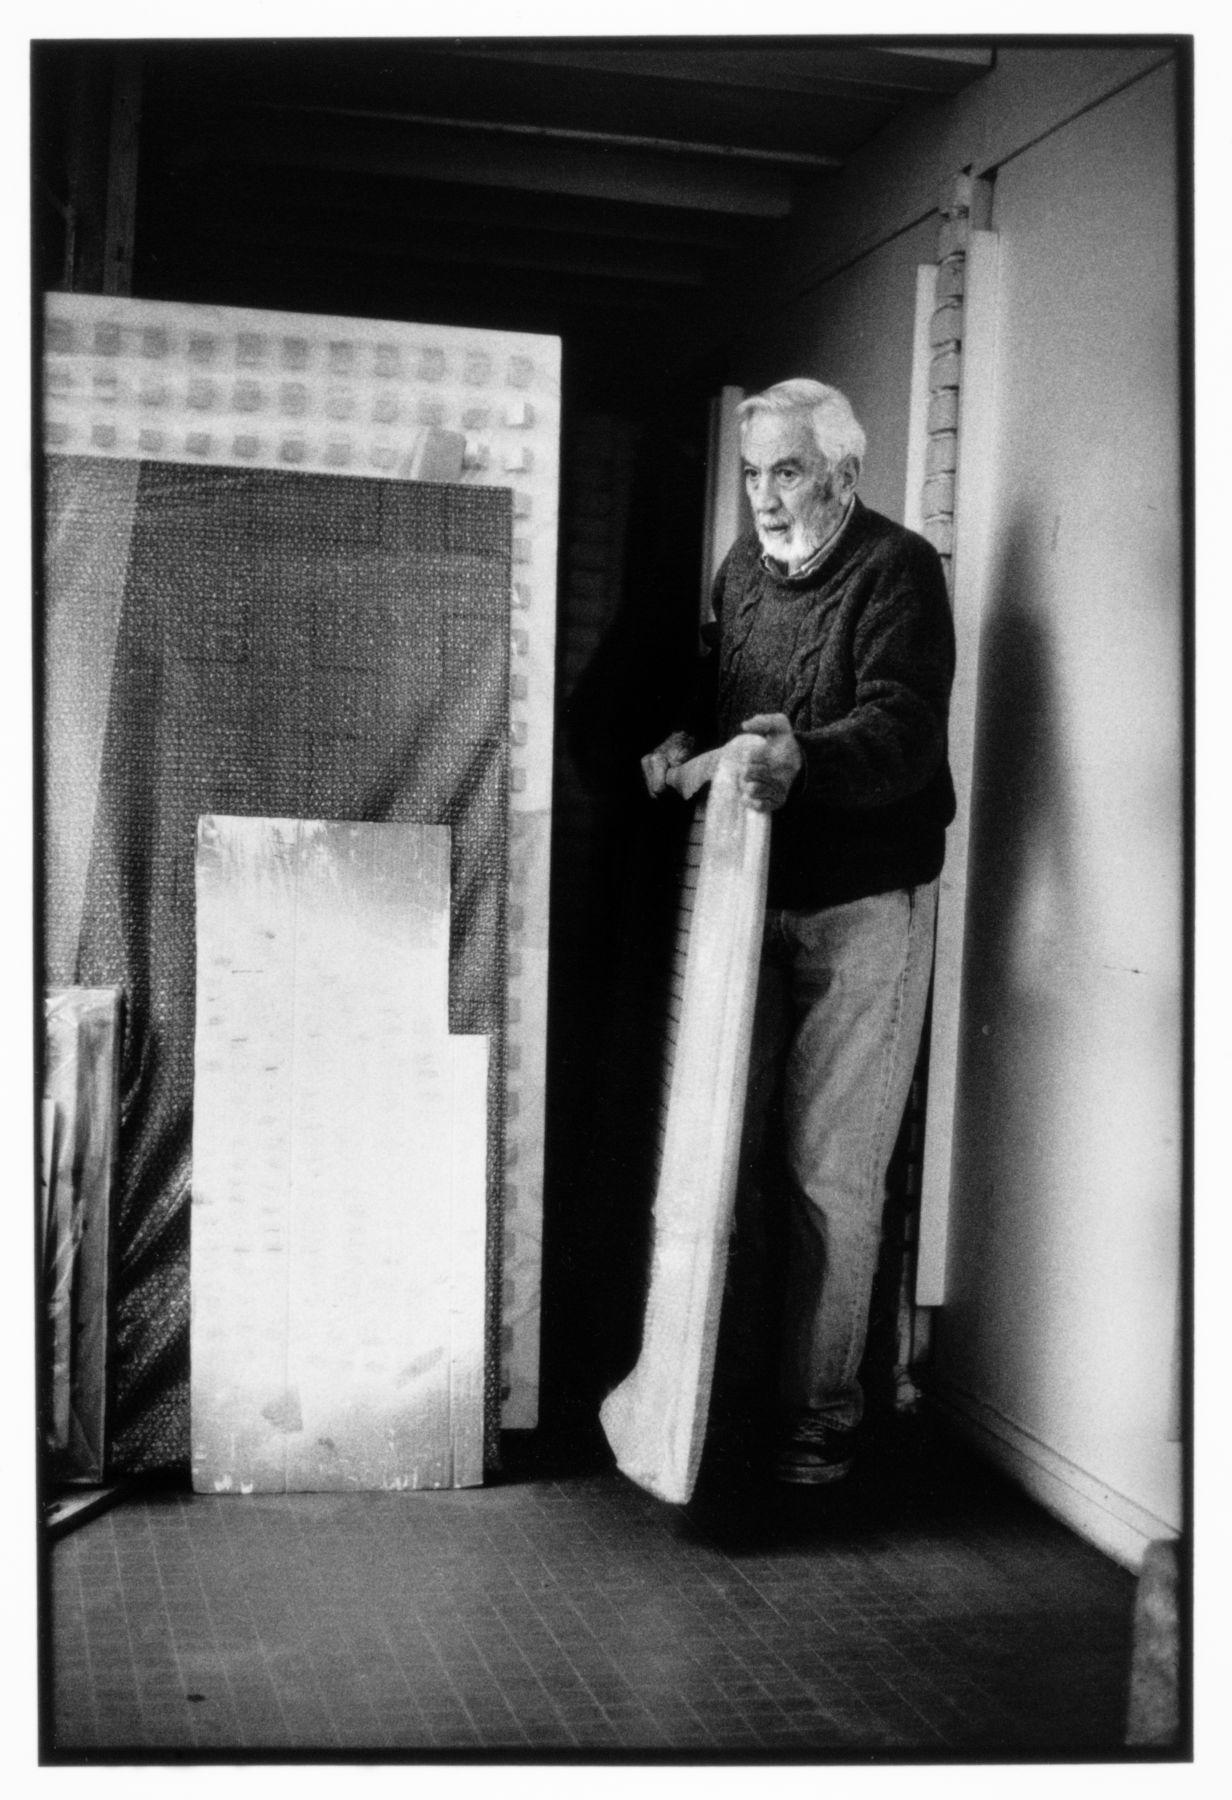 Luis Tomasello in his studio in Paris, 1990s. Photo credit Didier Gicquel